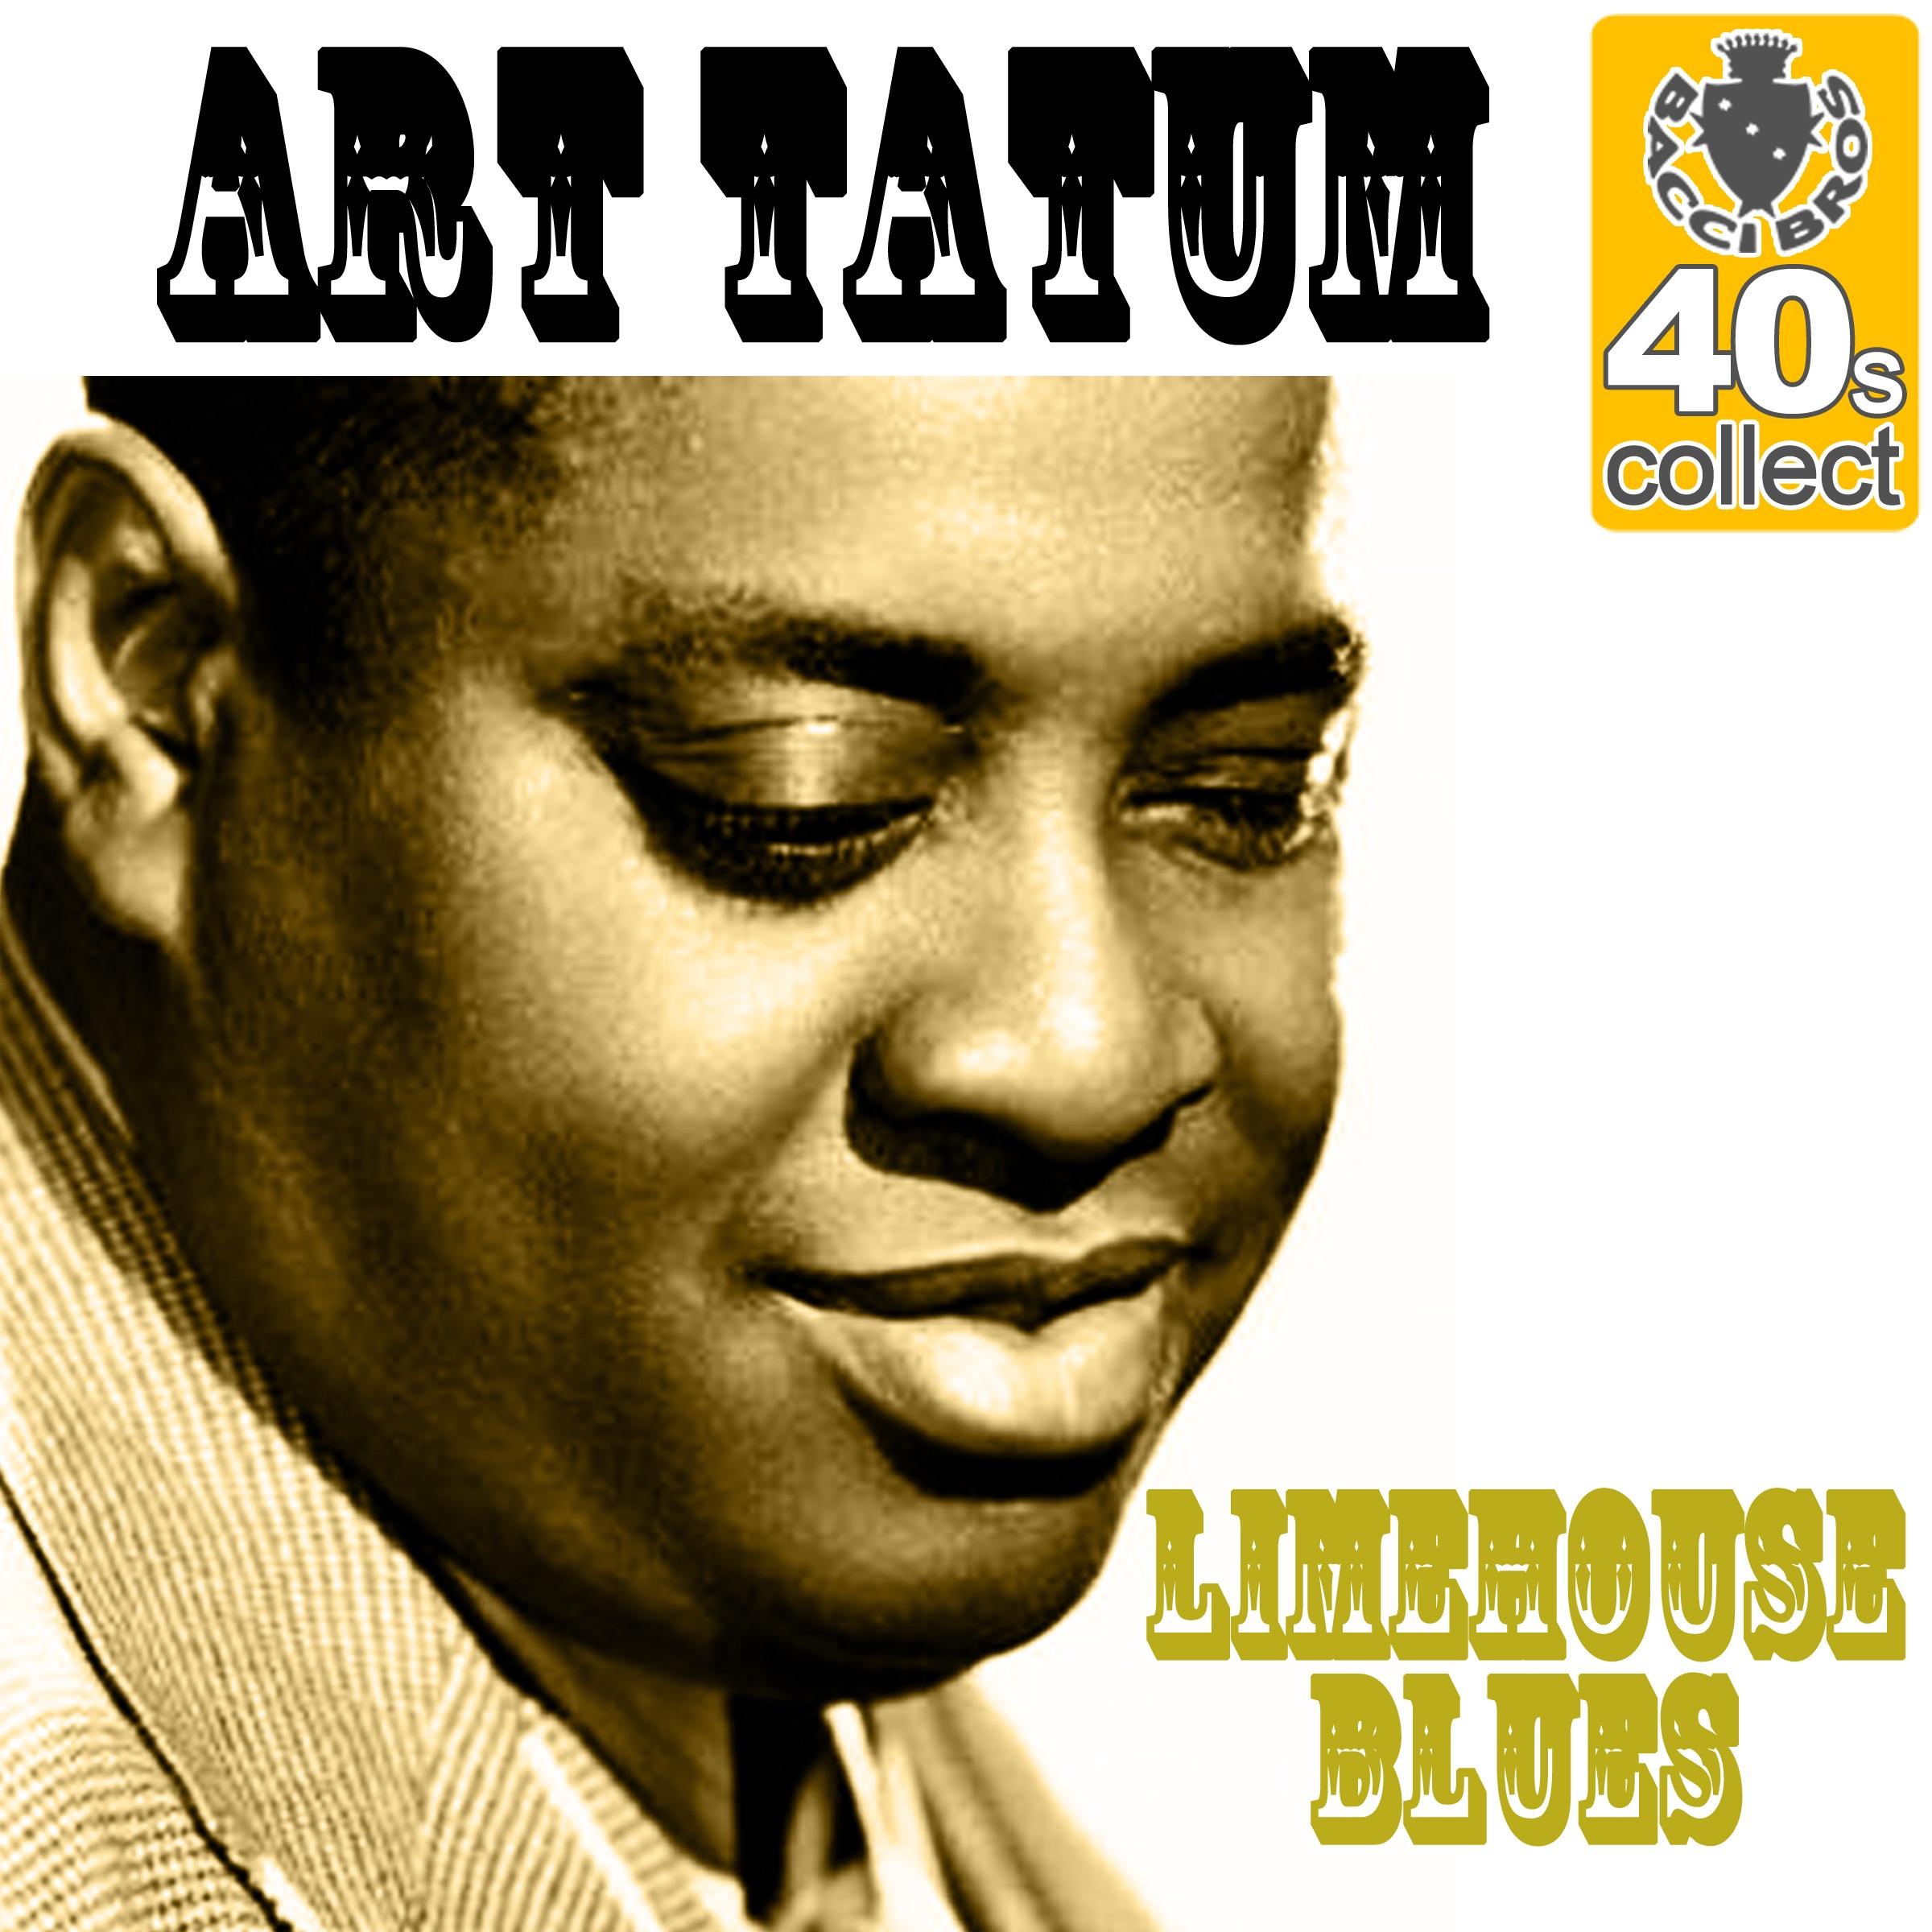 Limehouse Blues (Remastered) - Single